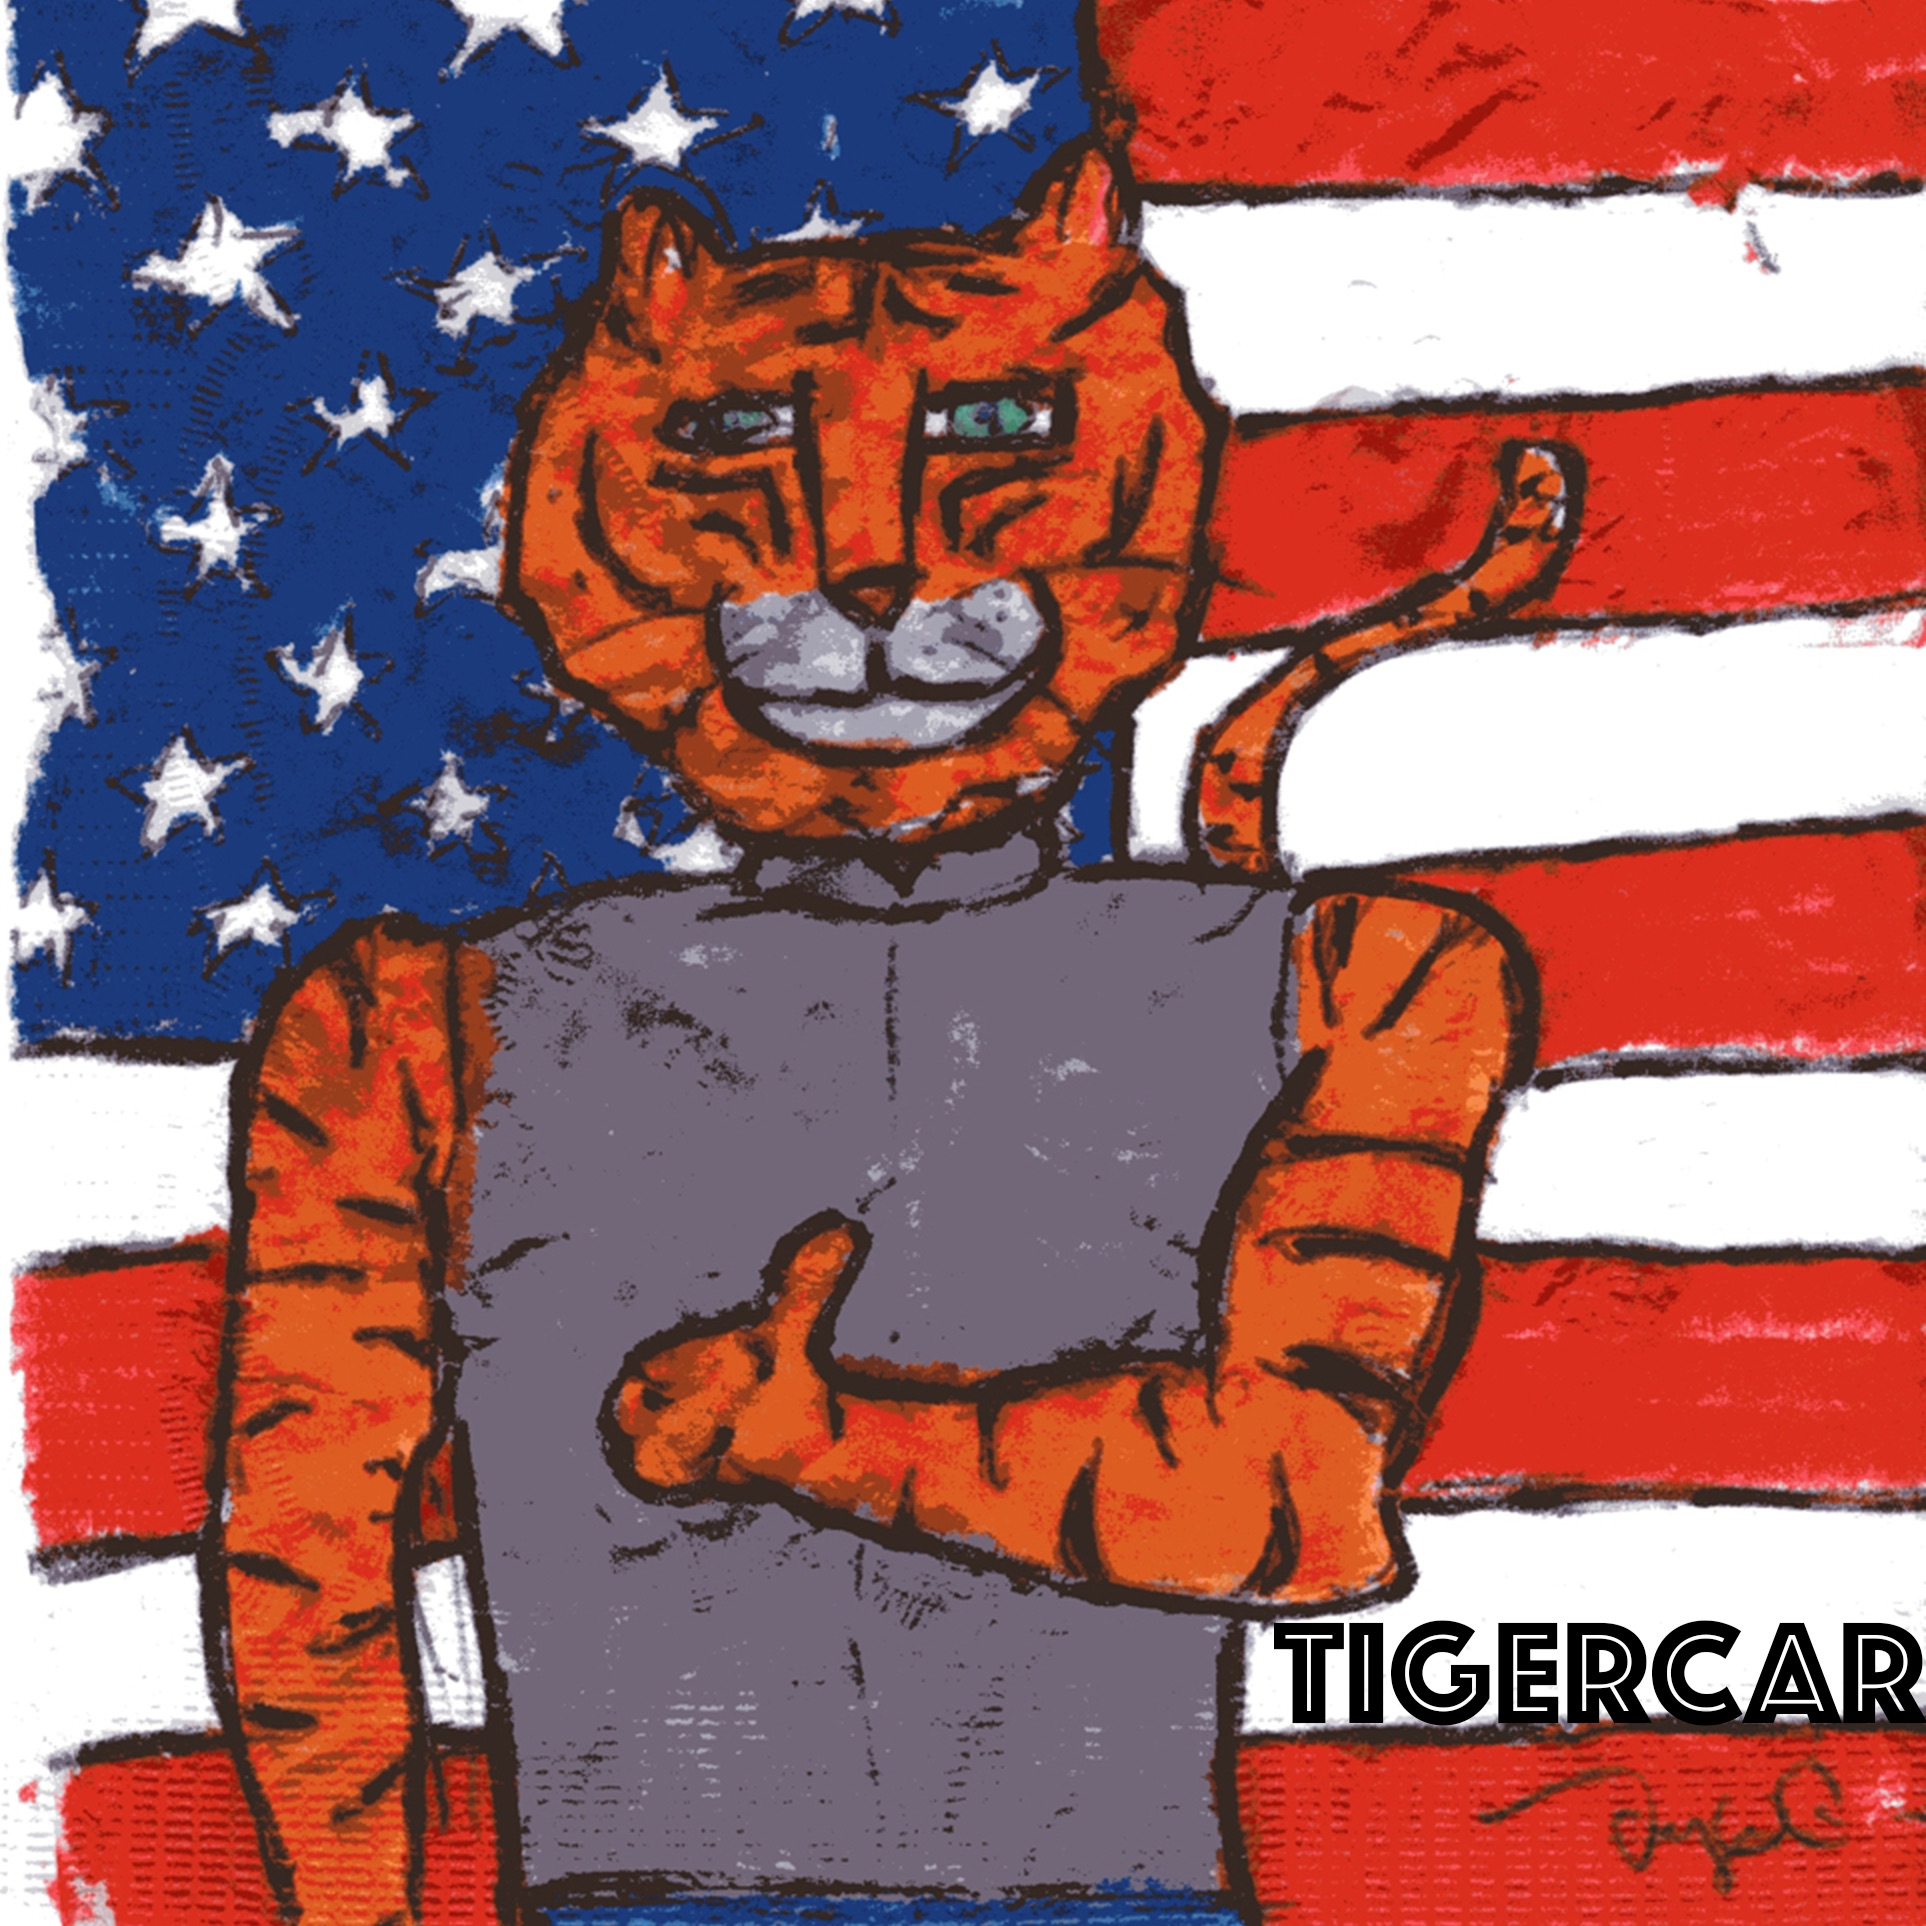 Tigercar